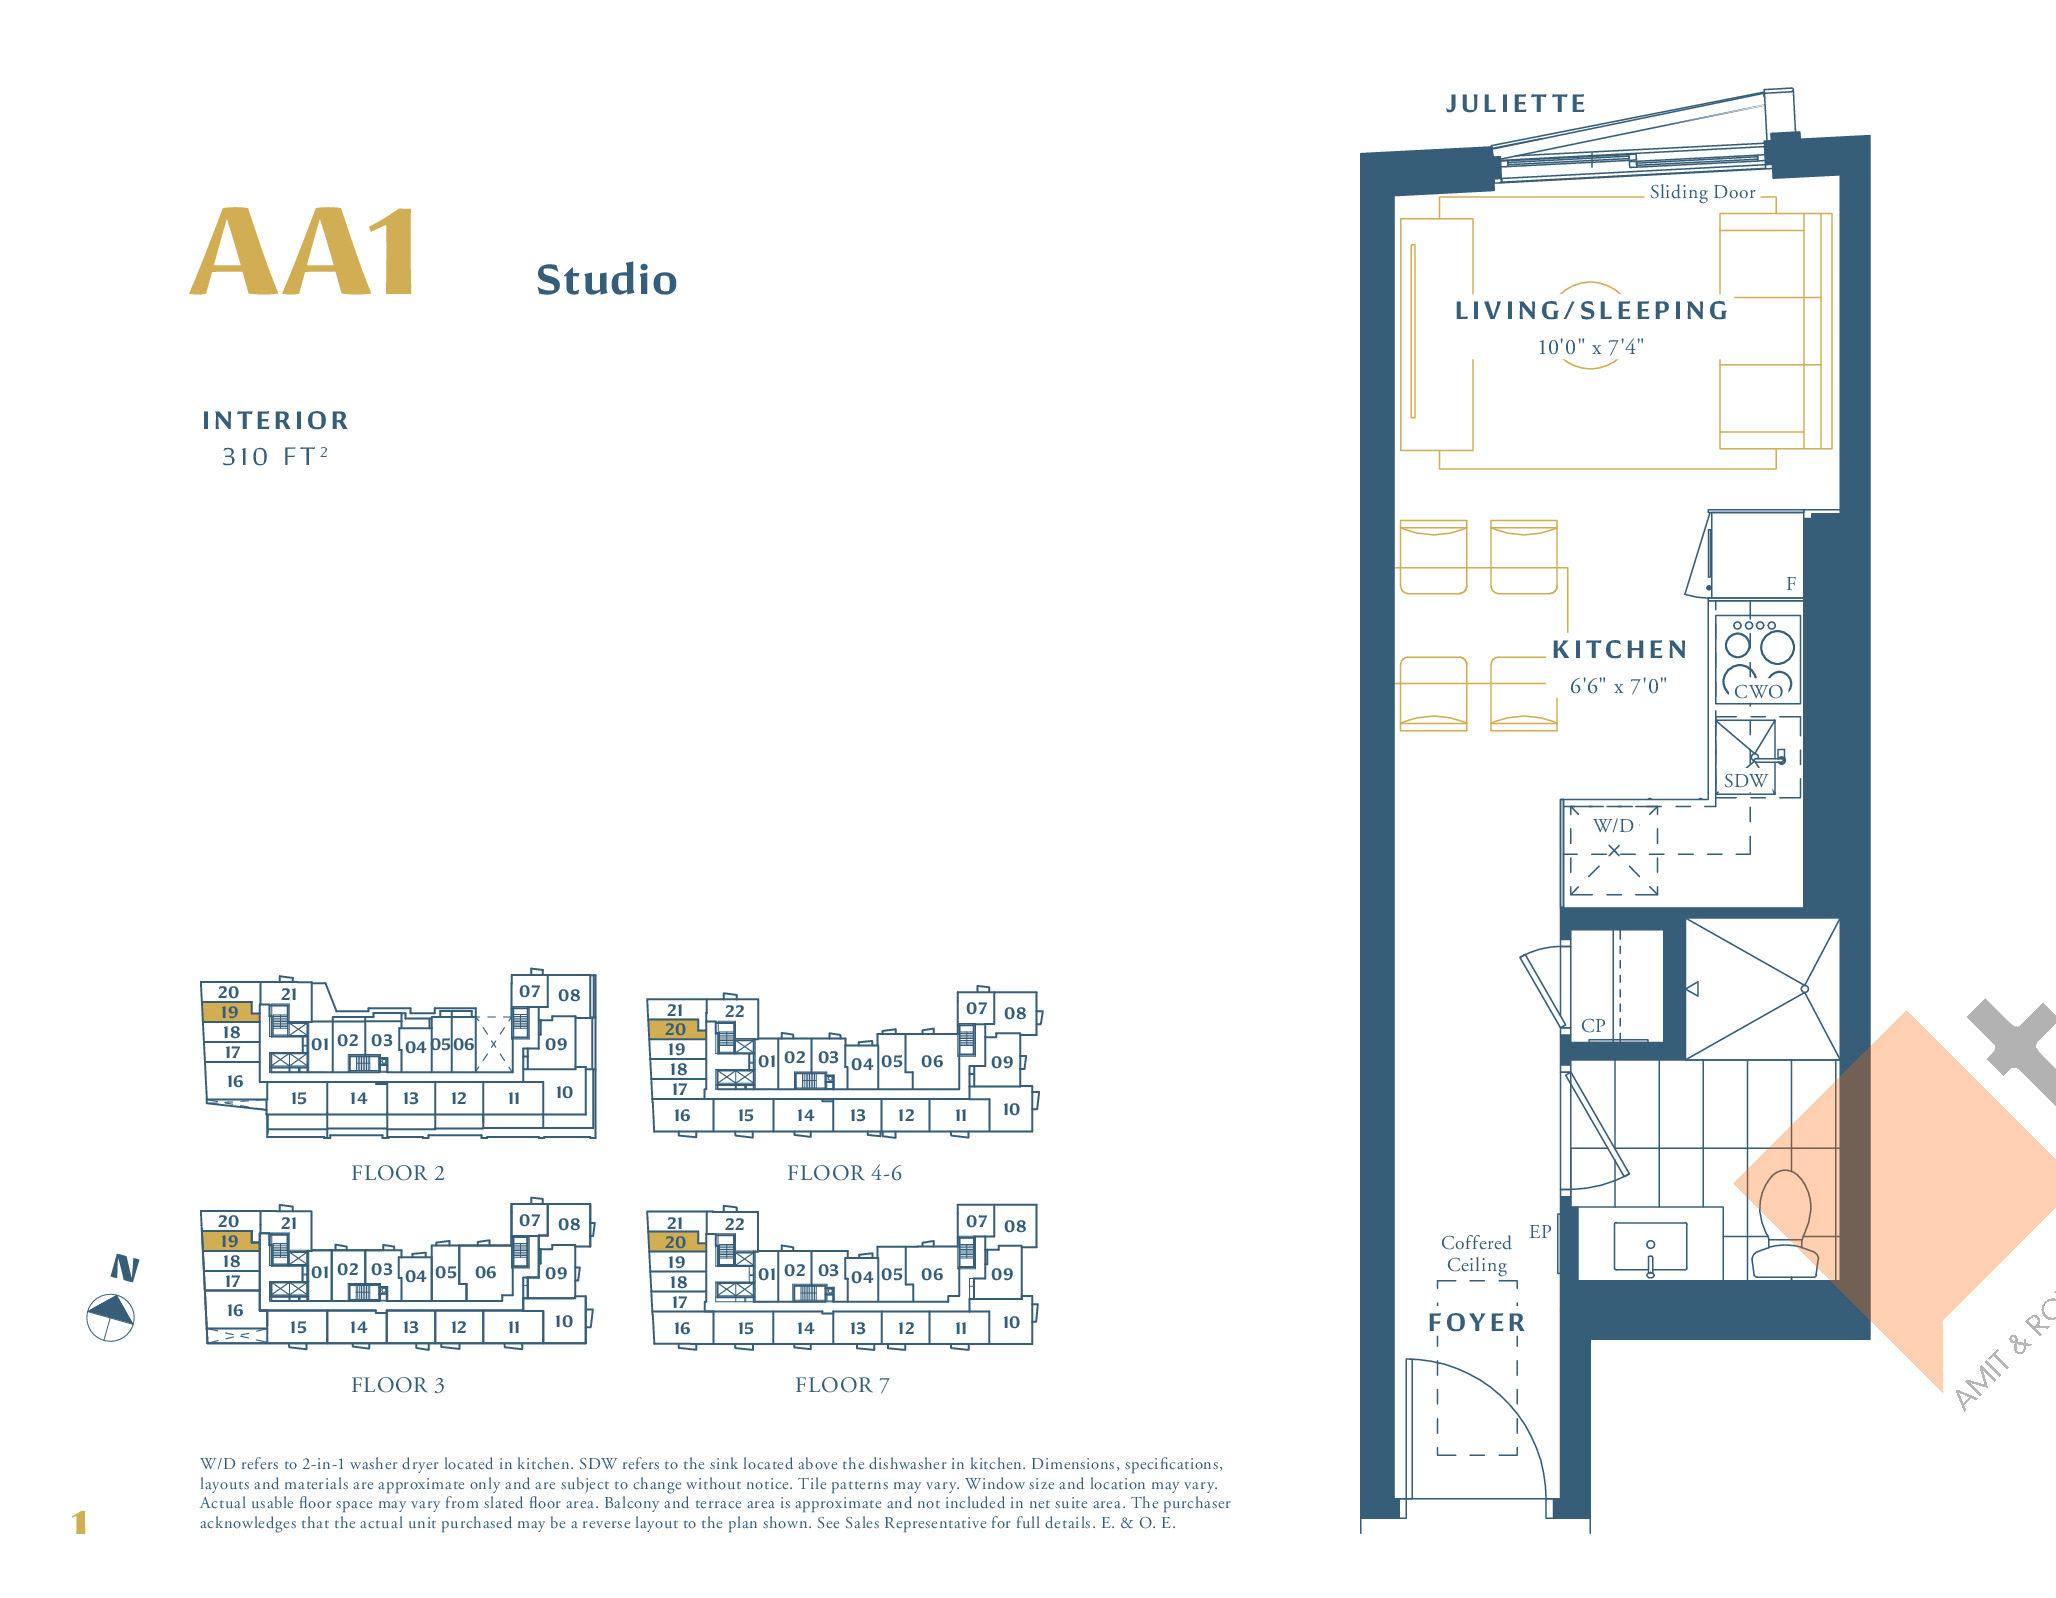 AA1 Floor Plan at The Borough Condos - Tower A - 310 sq.ft